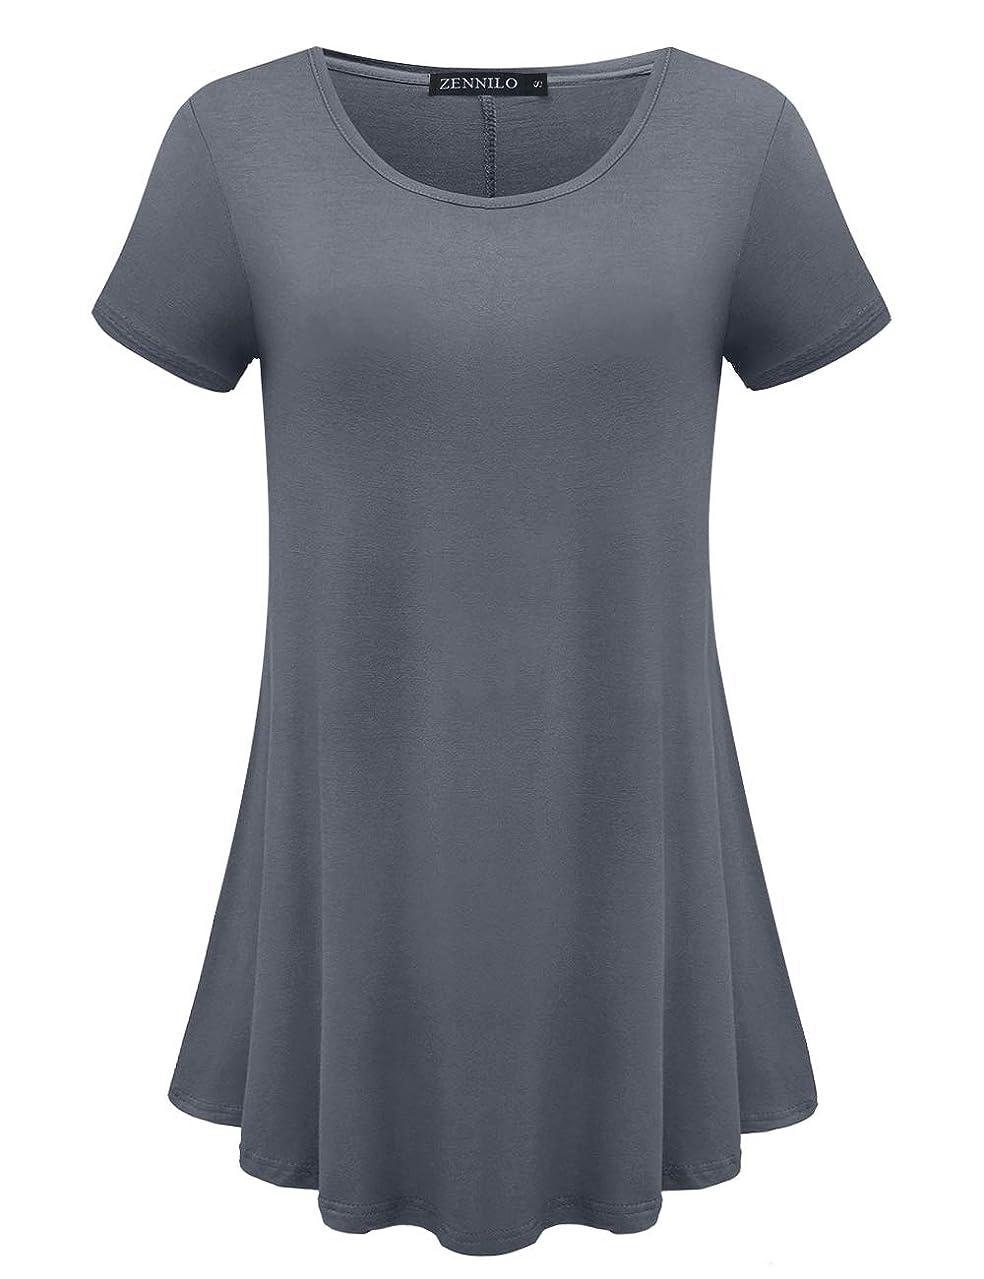 ZENNILO Womens Loose Fit Swing Tunic Tops for Leggings Basic T Shirt